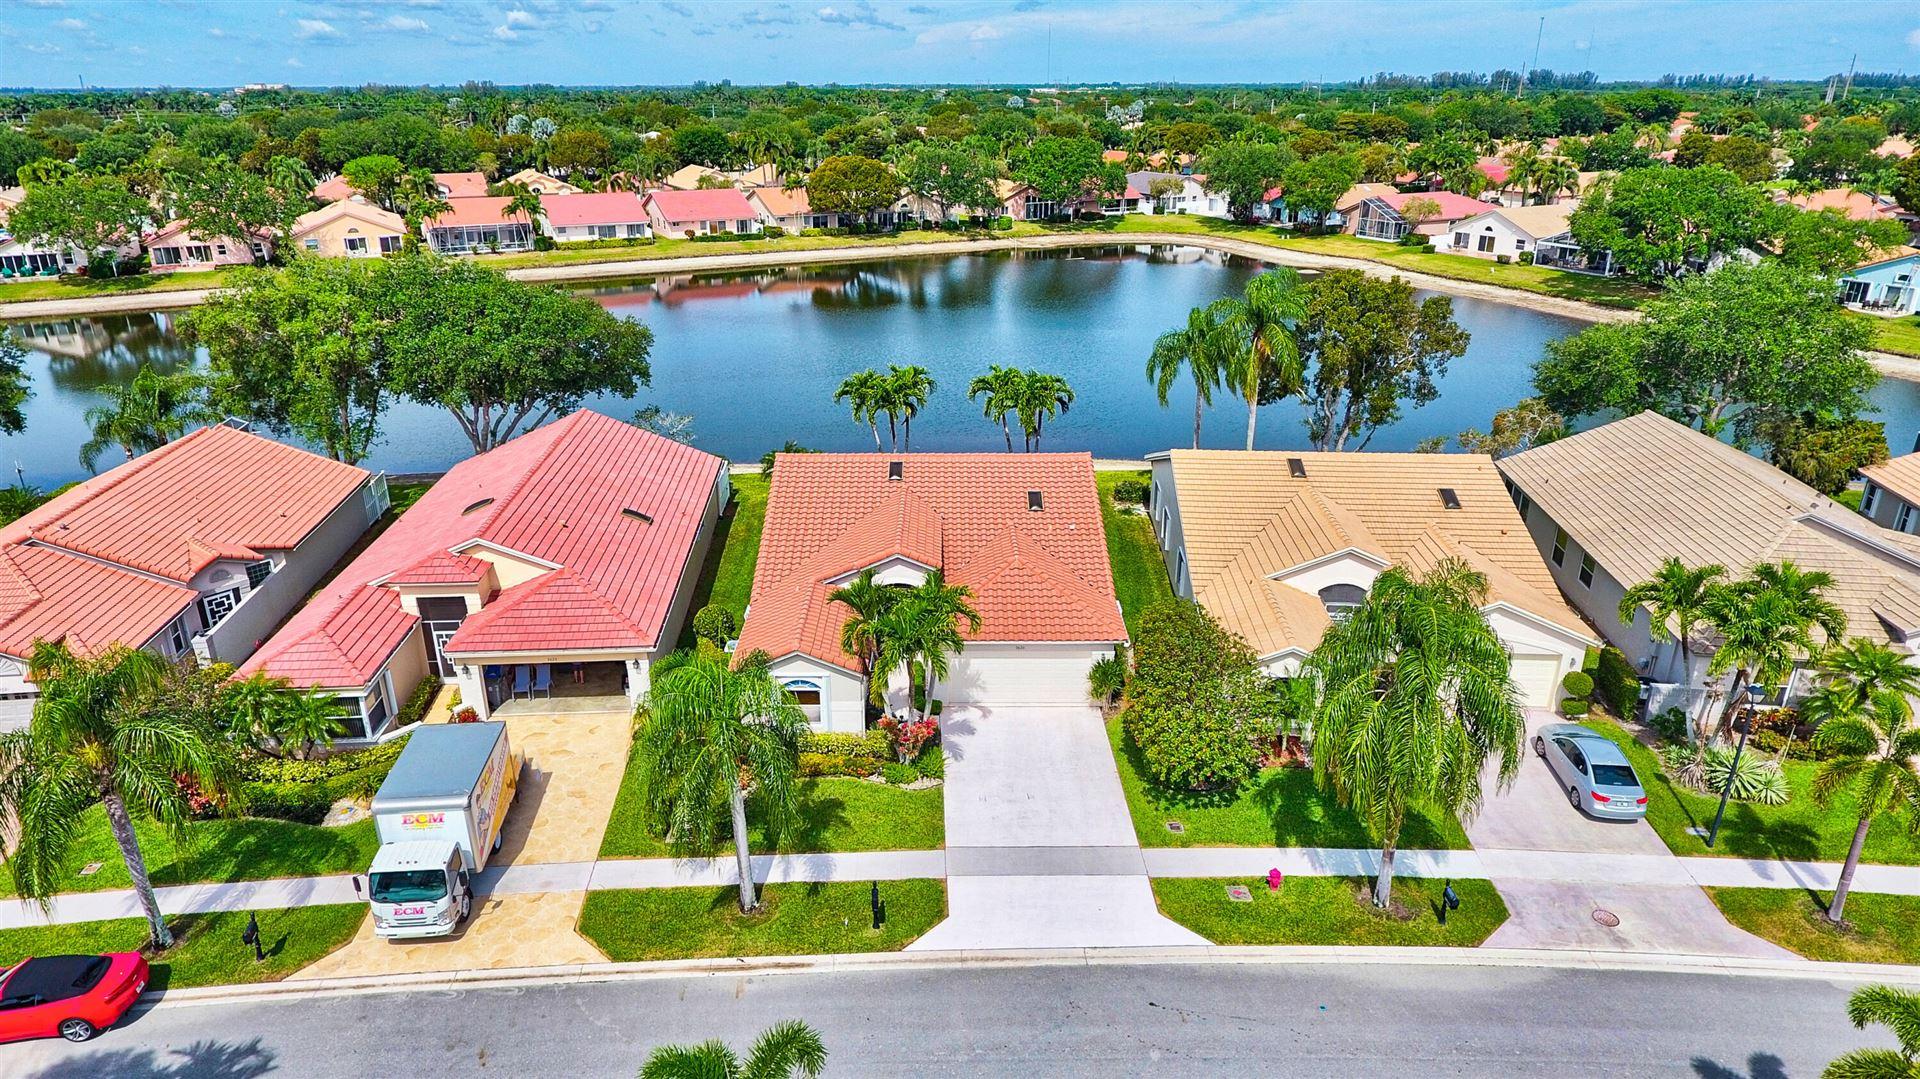 9629 Harbour Lake Circle, Boynton Beach, FL 33437 - MLS#: RX-10707256